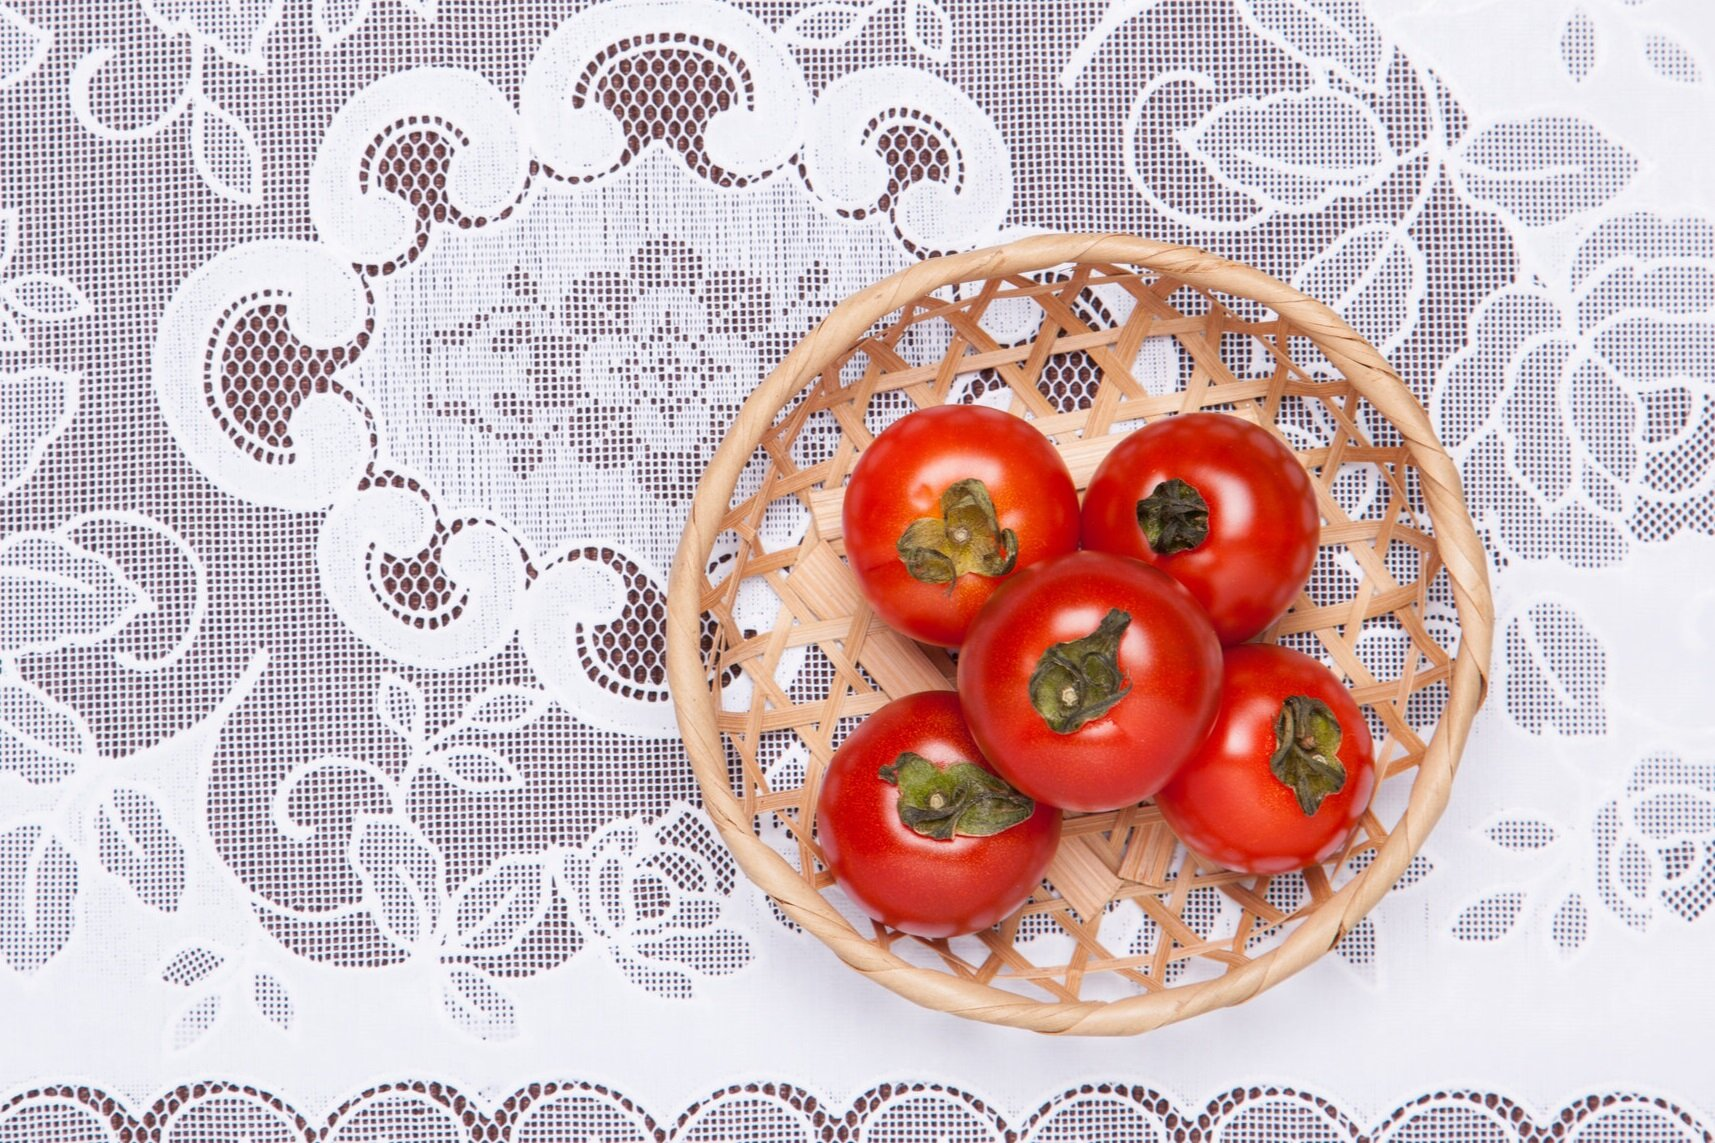 basket+of+tomatoes+on+lace+AdobeStock_65789508+%281%29.jpg